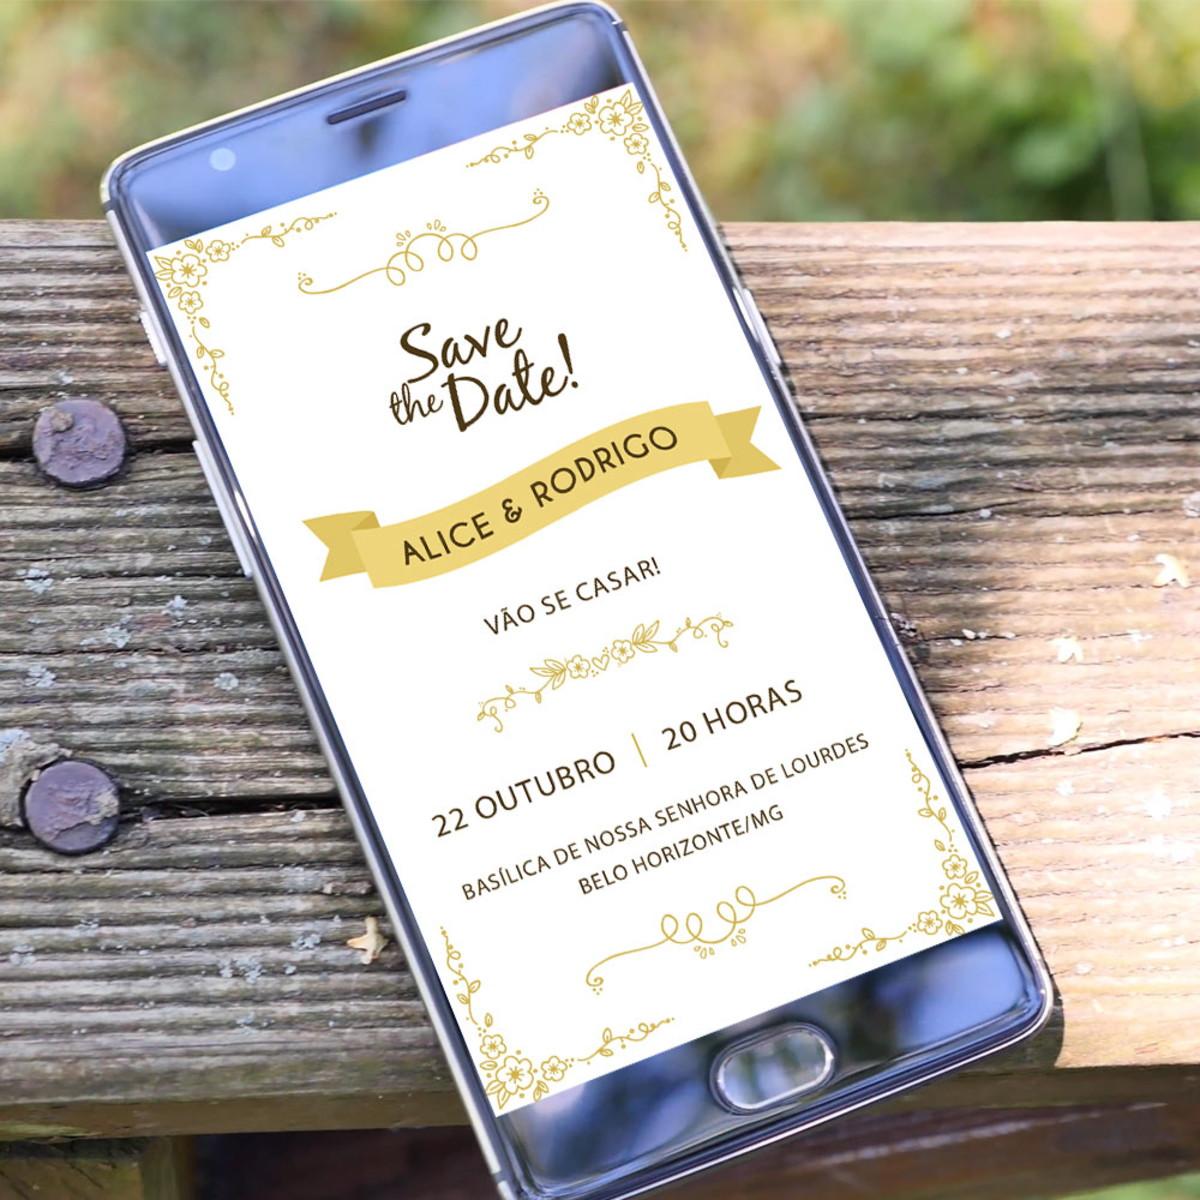 Save the Date Clássico - Digital Whatsapp no Elo7 | Janna